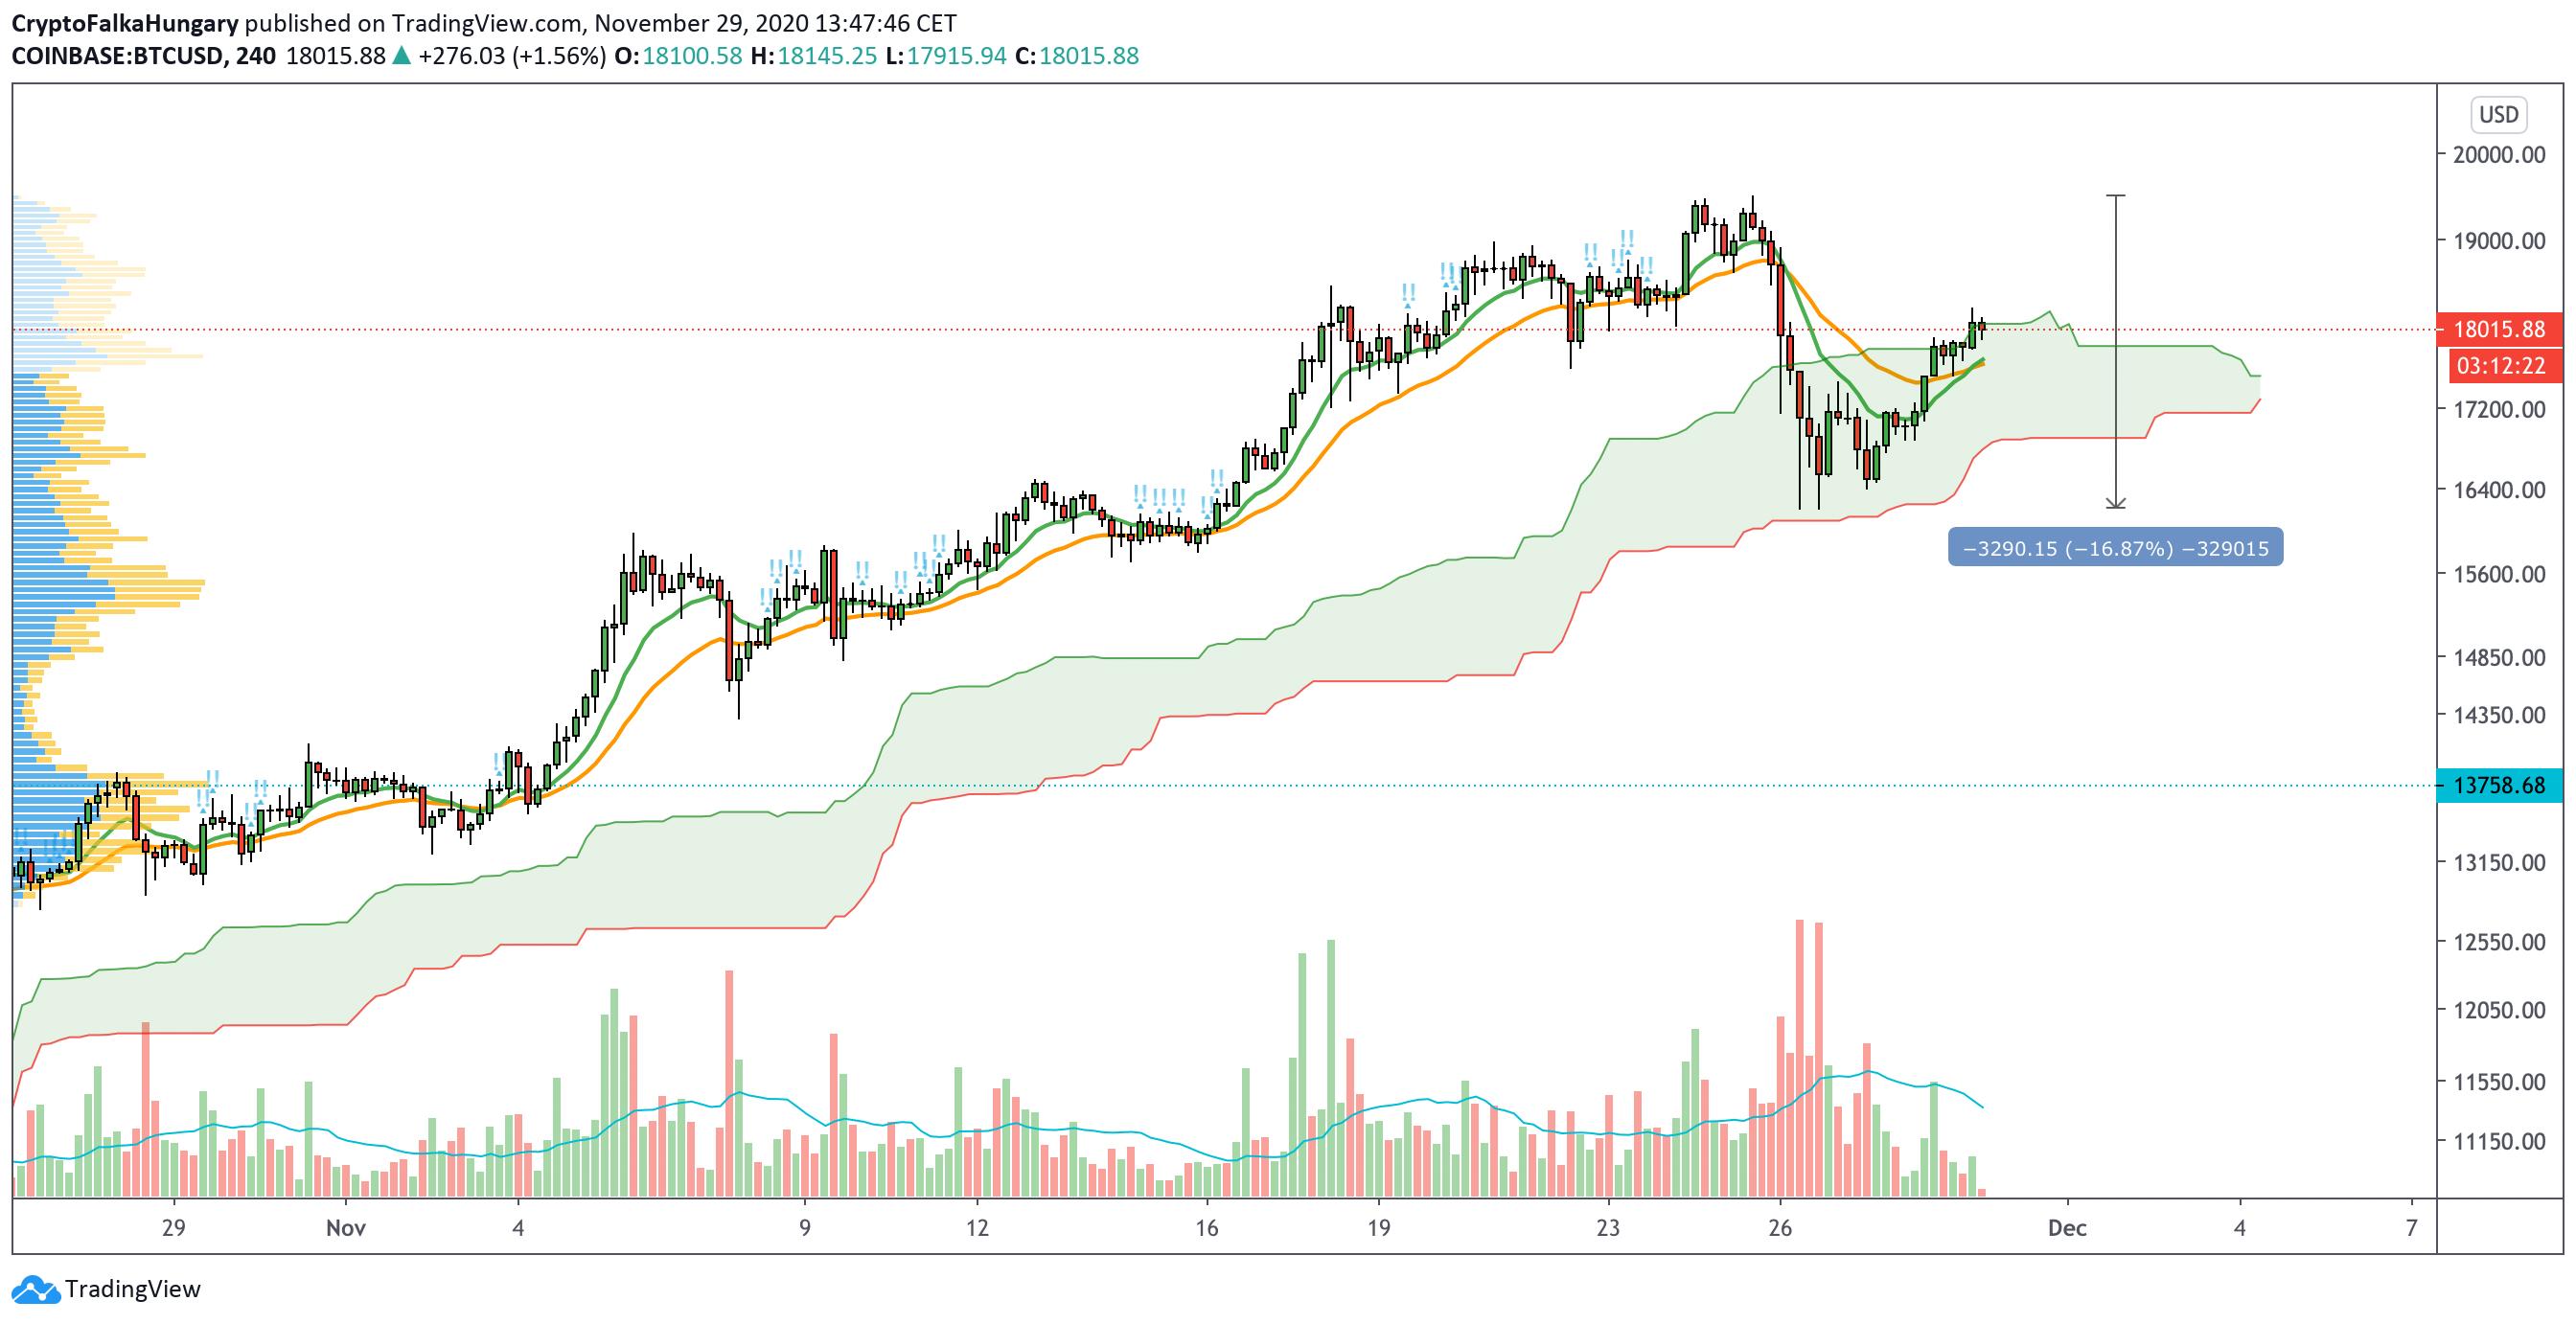 Bitcoin árfolyam korrekció I Cryptofalka